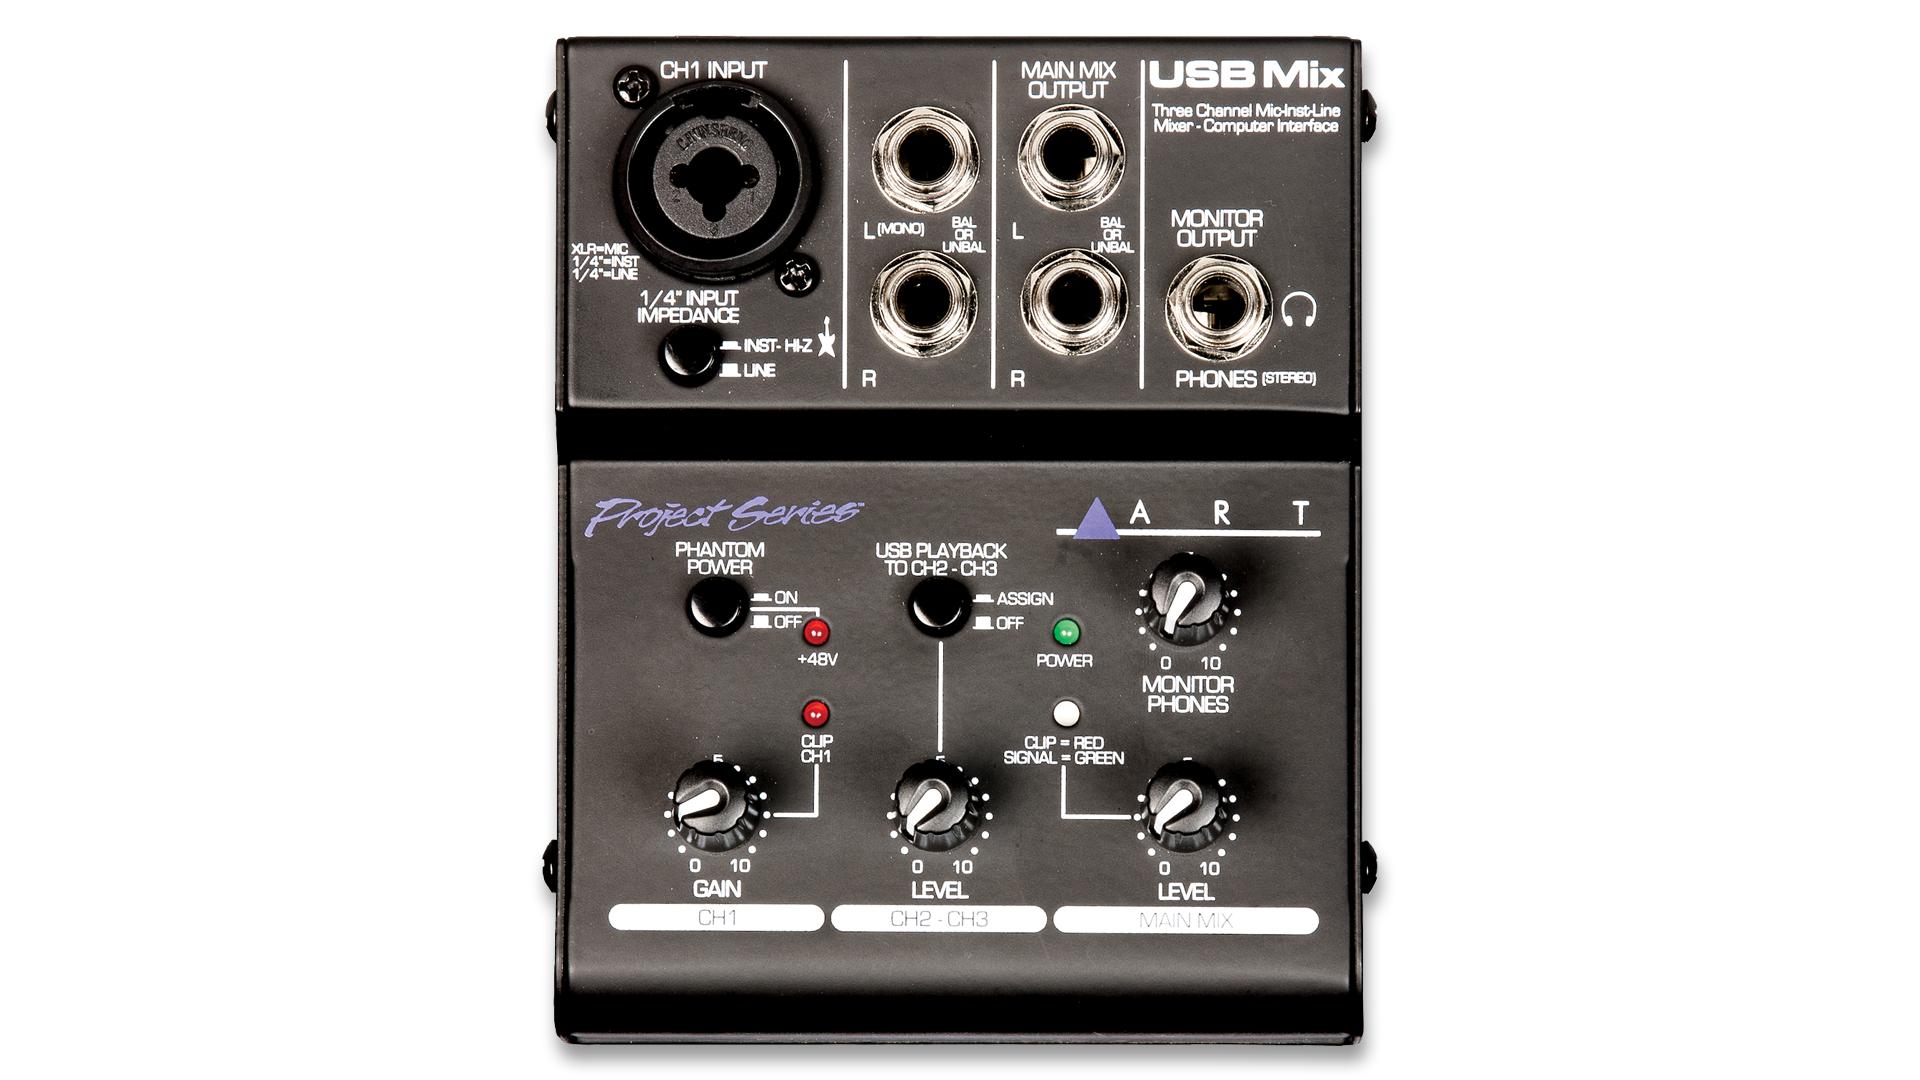 USB Mix – Project Series – ART Pro Audio